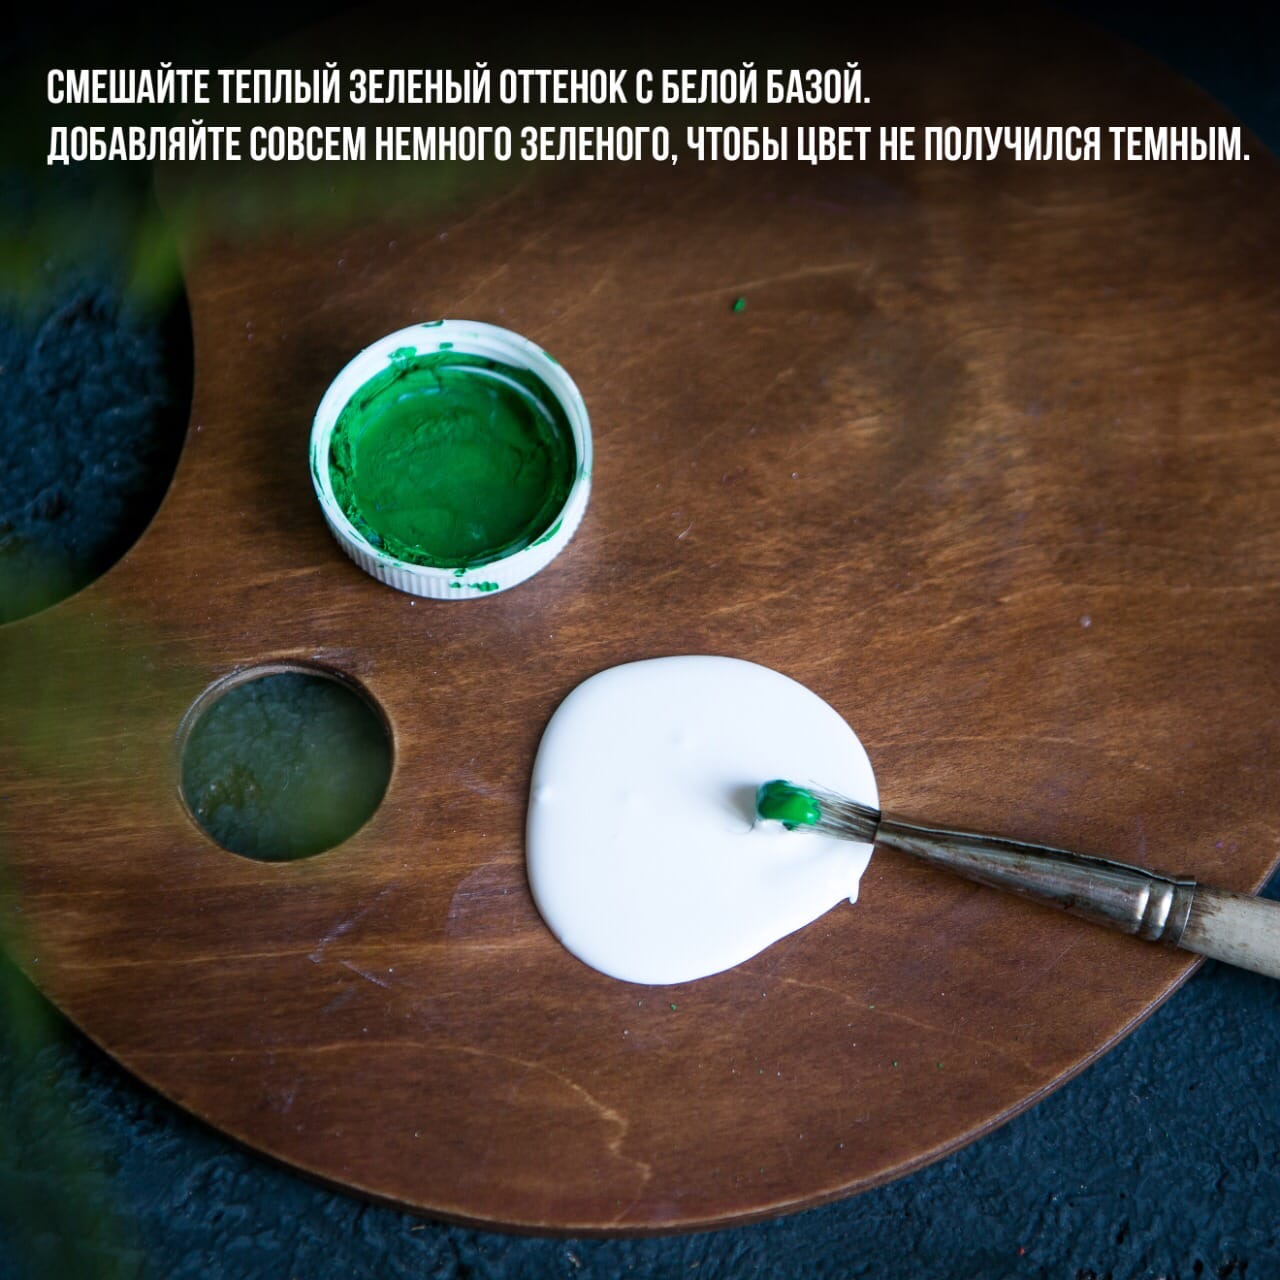 Теория цвета - оттенок Тиффани, бирюзовый